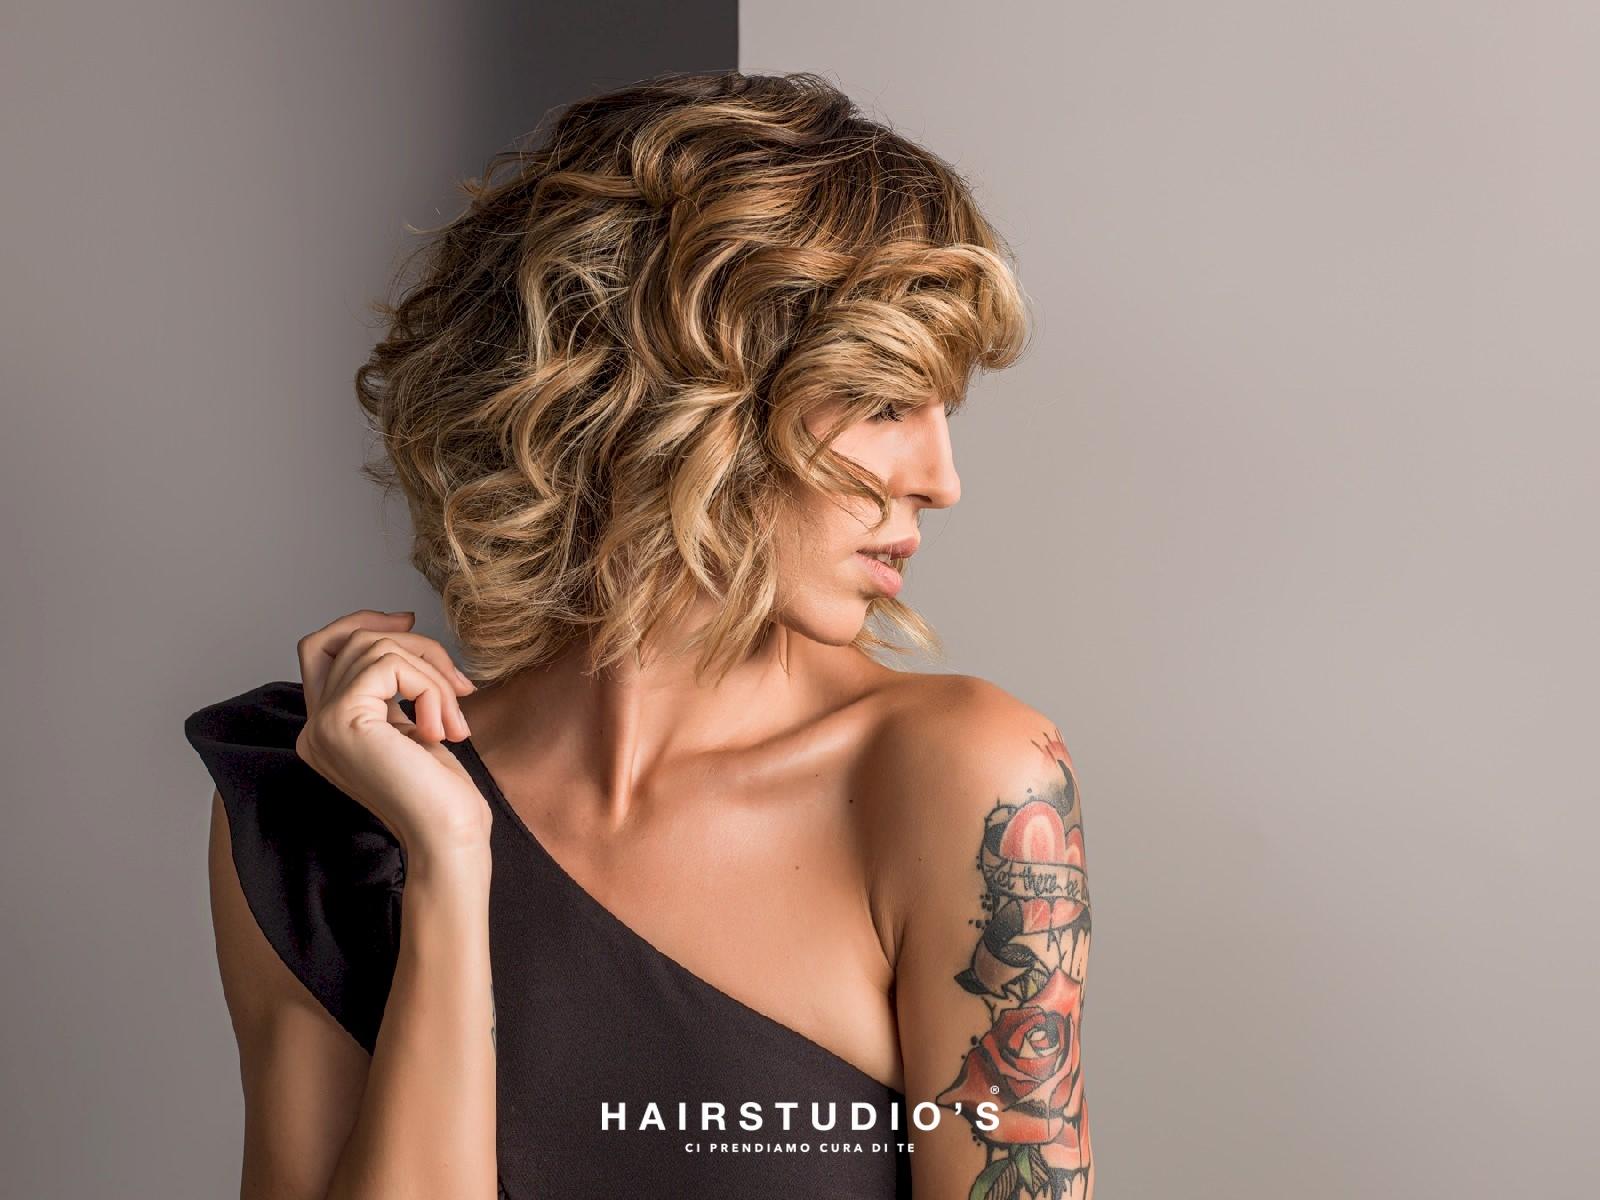 Pieghe Moda Hairstudios